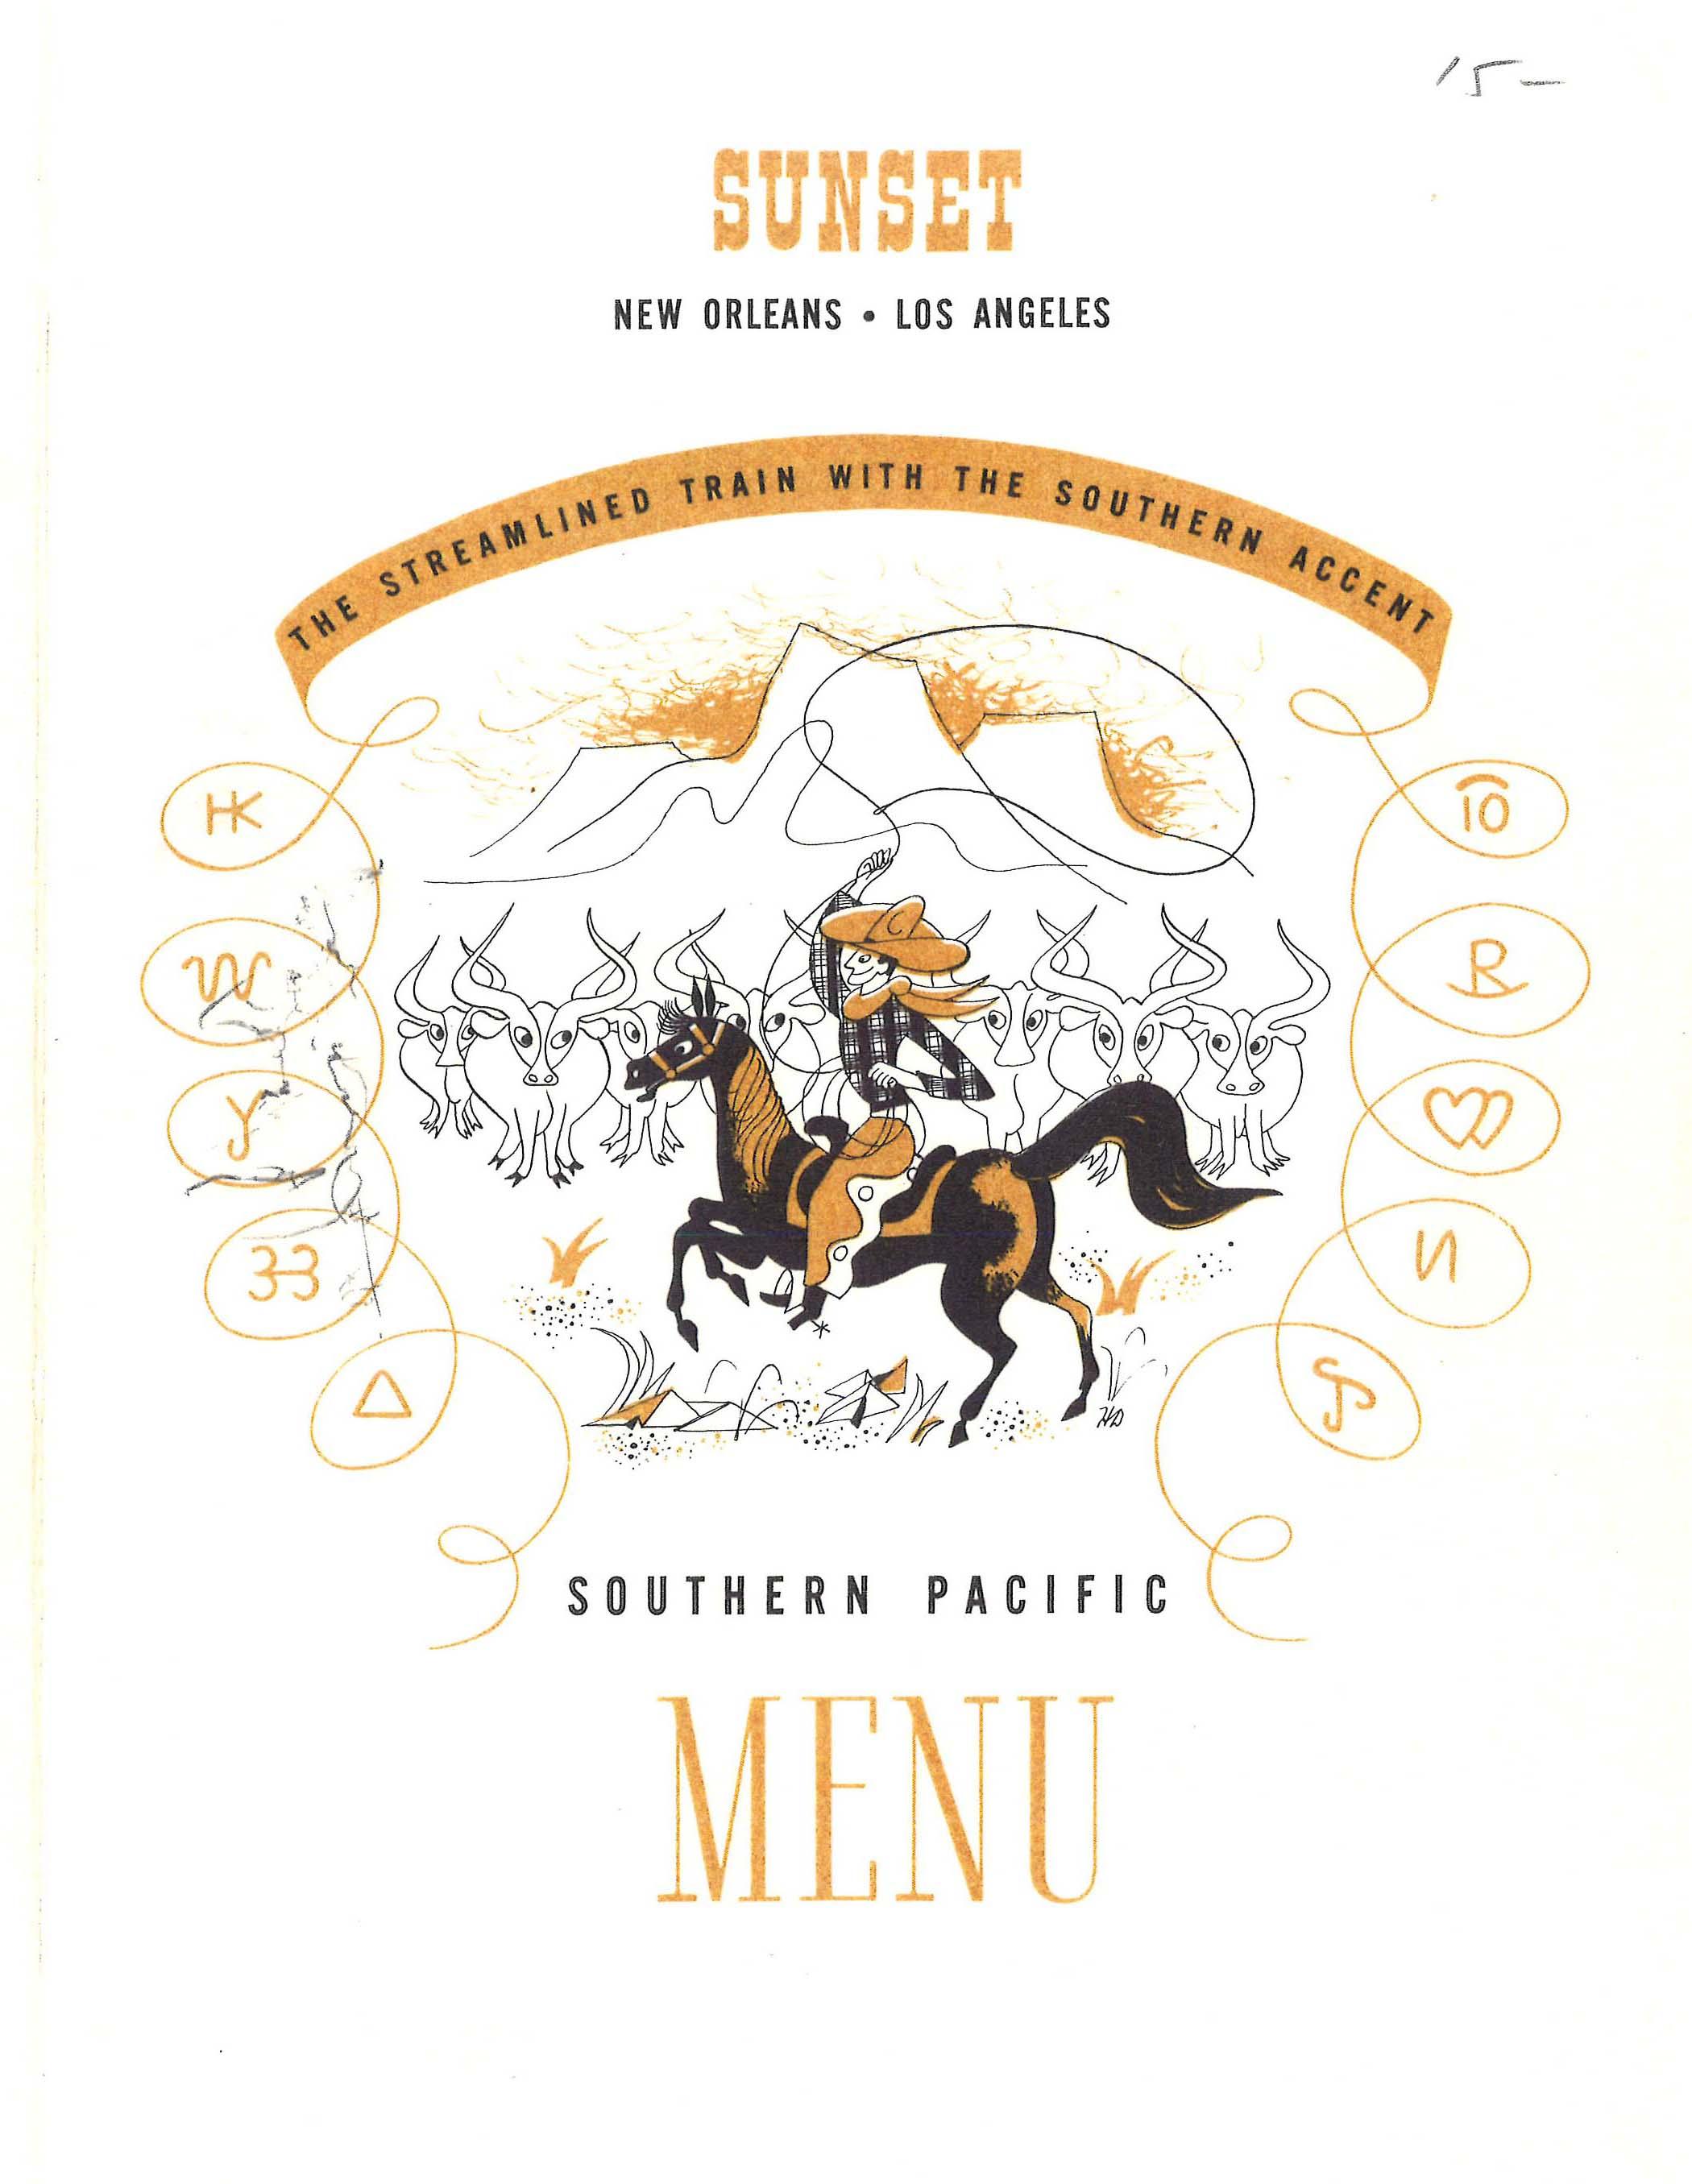 SP+John+James+Audubon+Dinner+Menu+3-65 1a.jpg